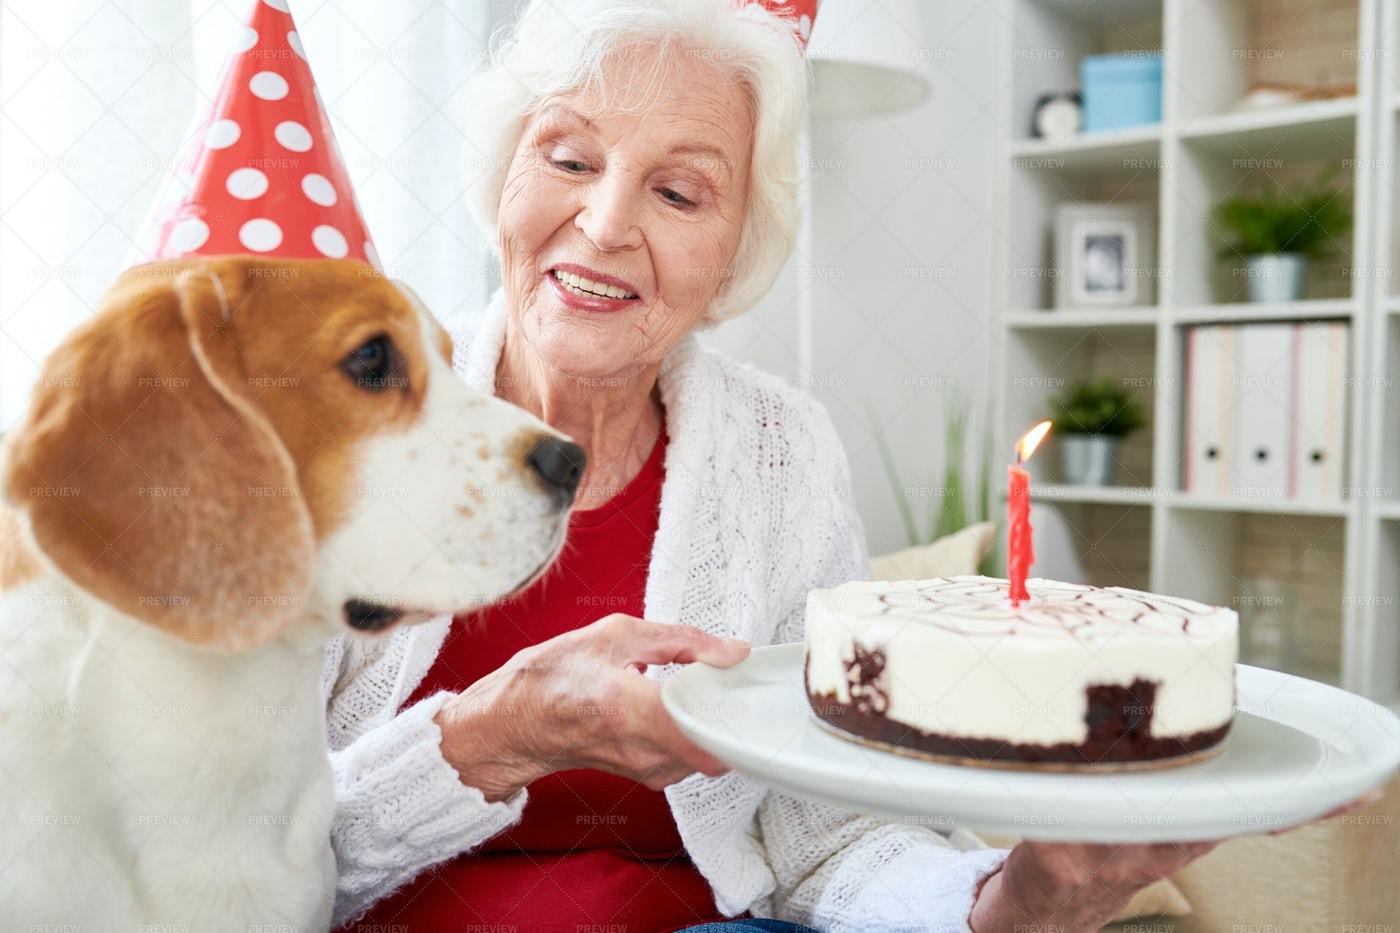 Senior Woman Holding Birthday Cake: Stock Photos